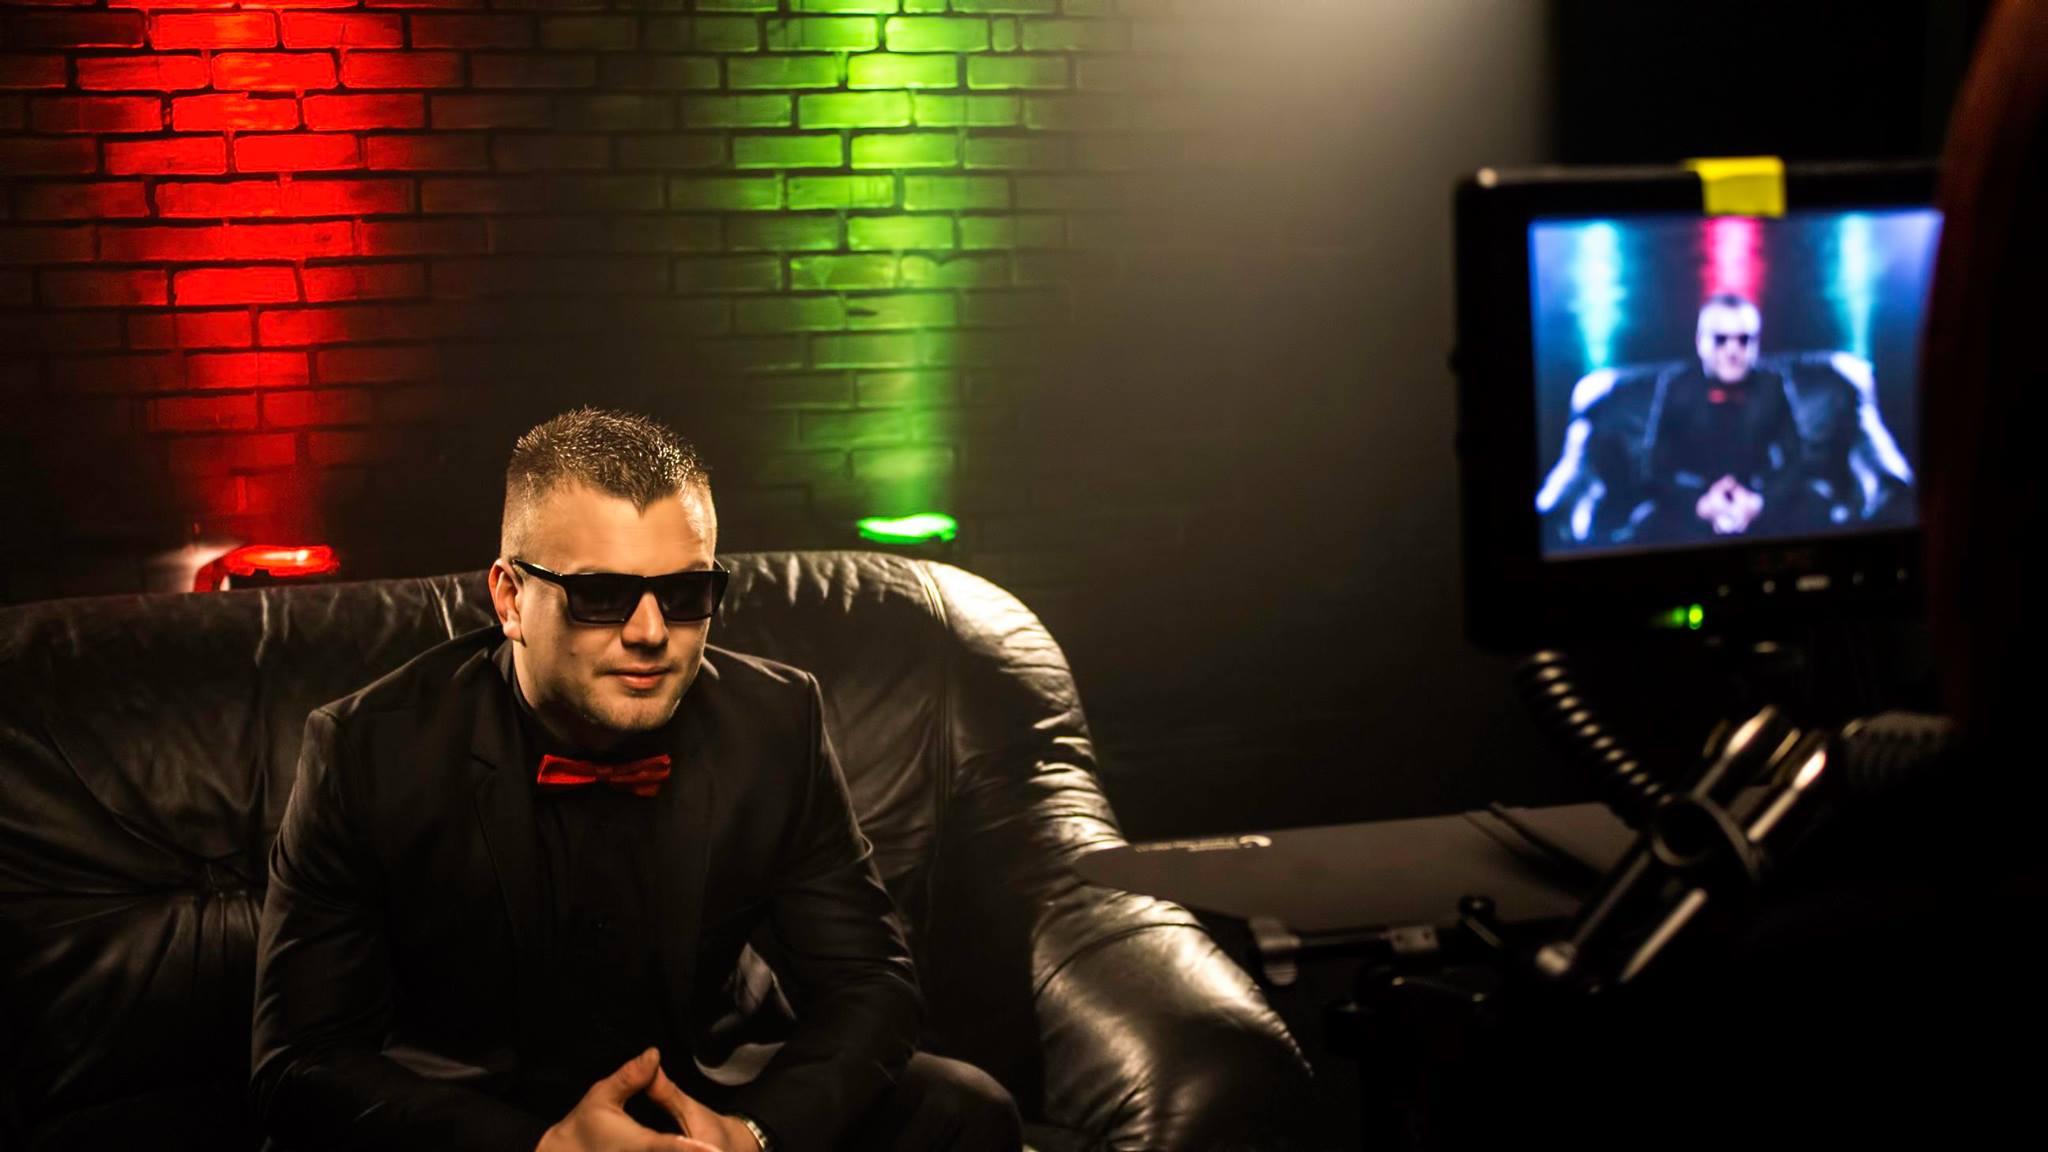 Djomla KS feat. Ellena & DJ Roby - 2014 - Ljubomora (Single)